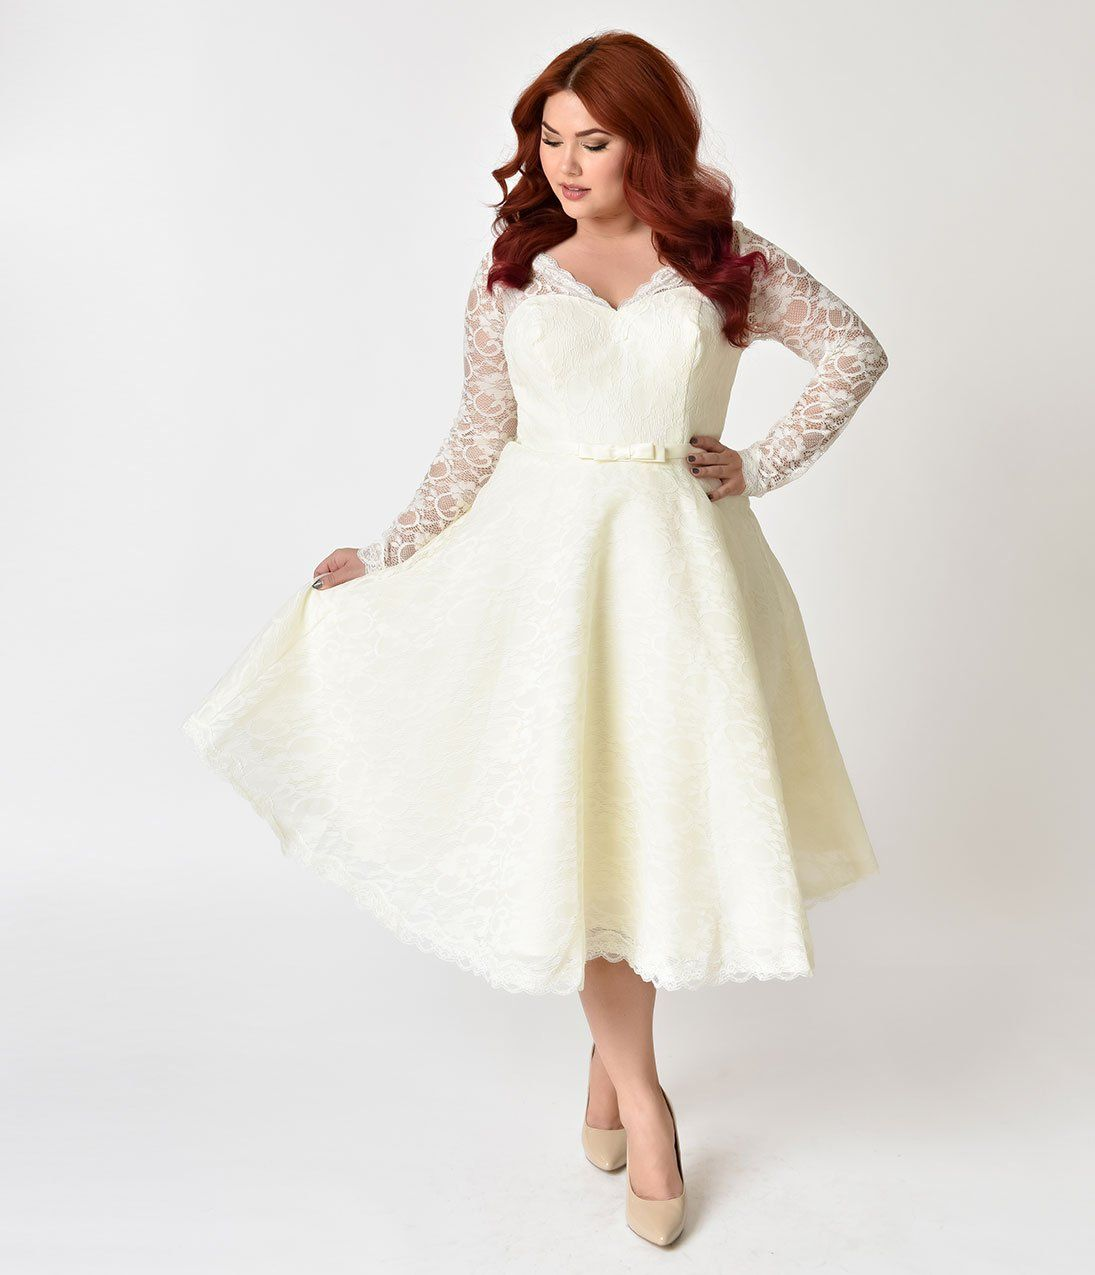 Unique Vintage Plus Size 1950s Style Ivory Lace Long Sleeve Martinique Swing Dress Dresses Long Sleeve Lace Swing Dress